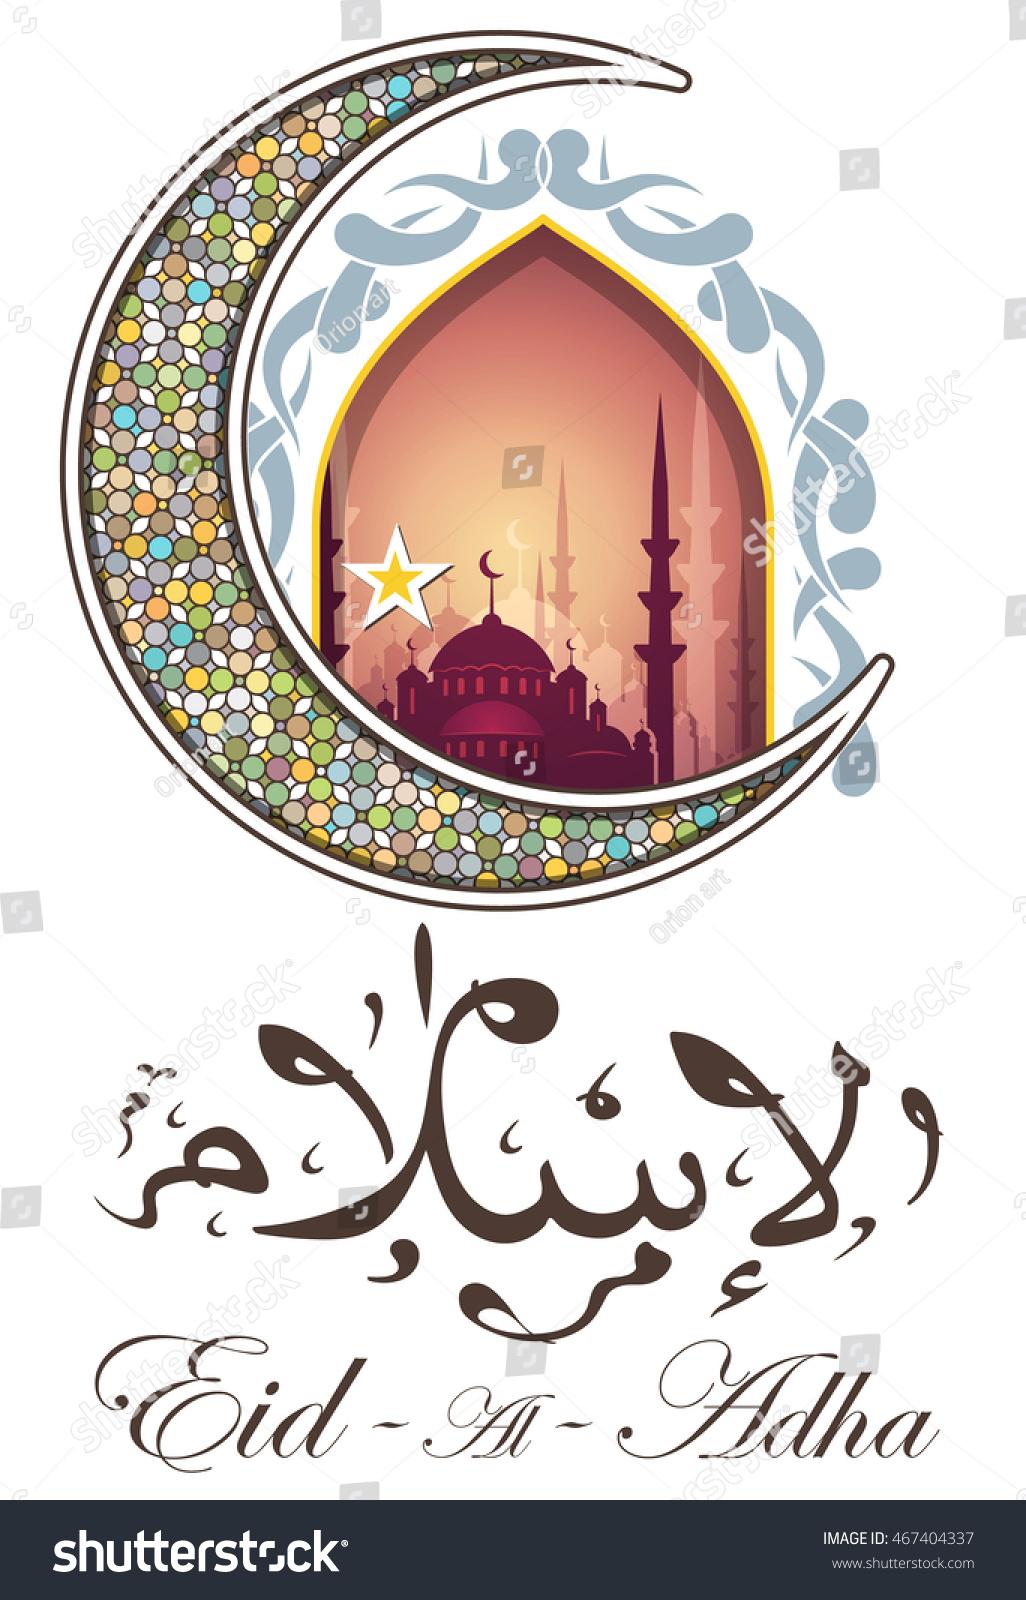 Eid Al Adha Greeting Cards Religious Stock Vector 467404337